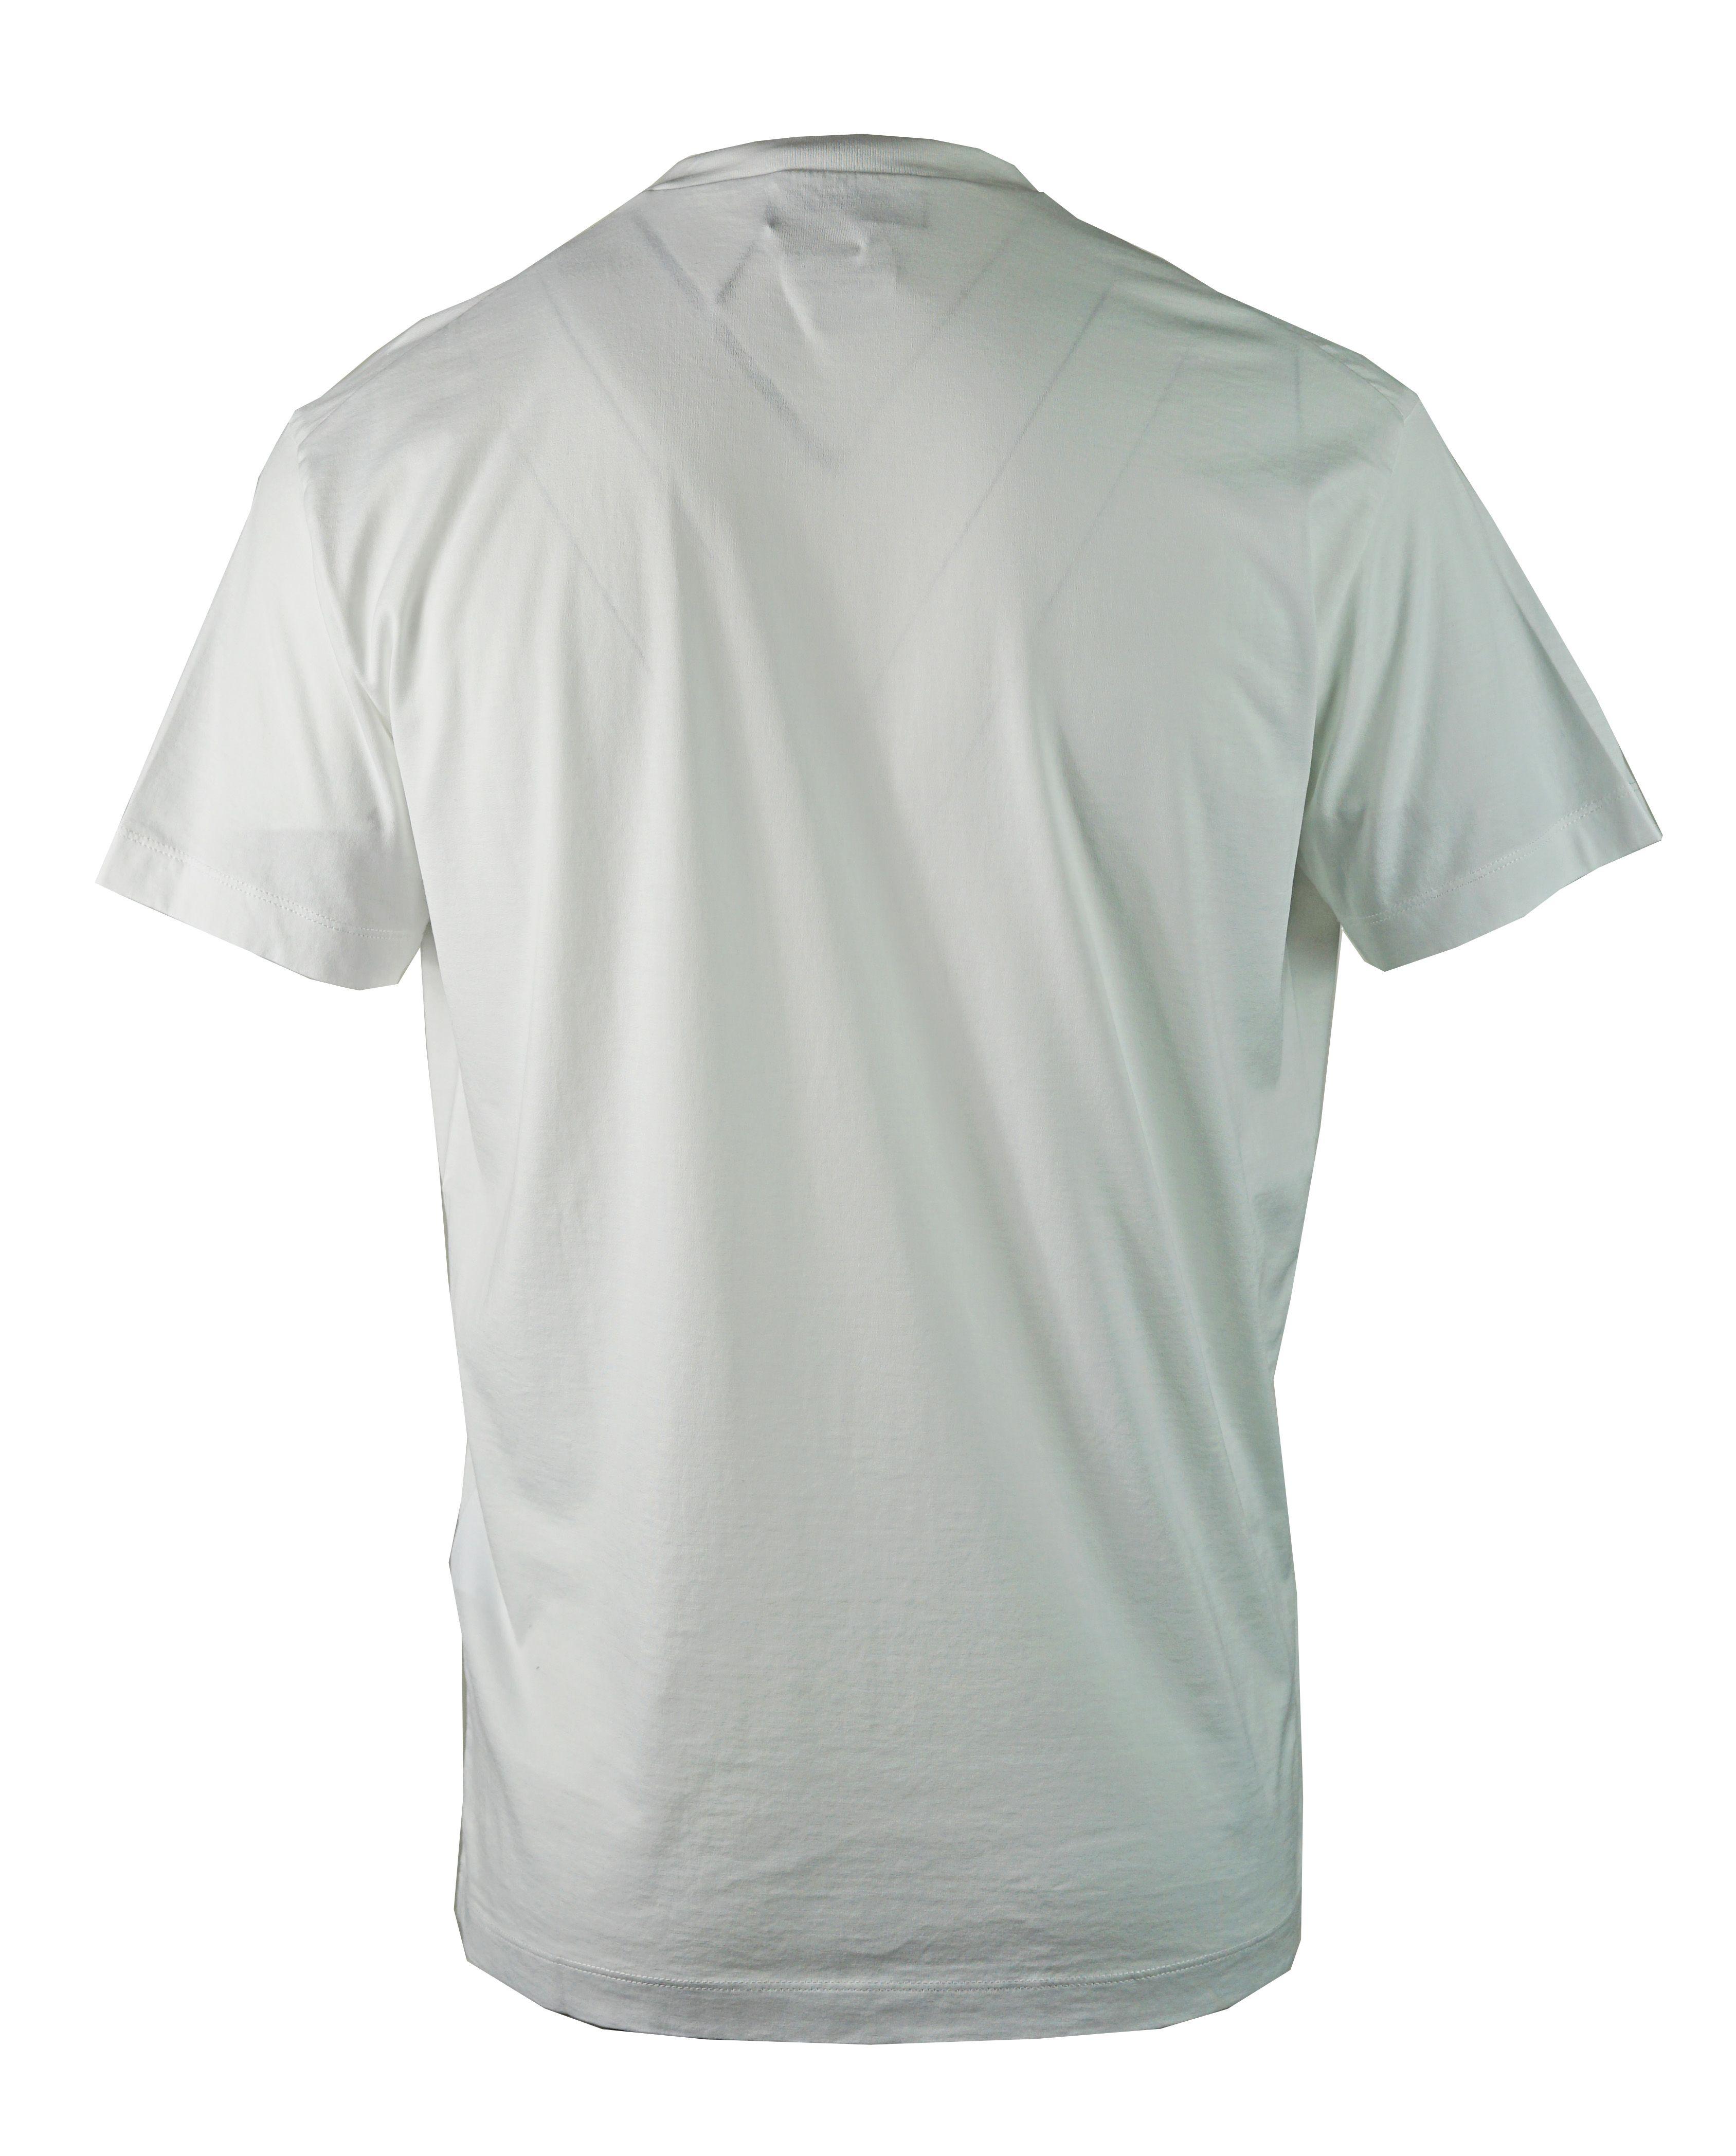 DSquared2 S74GD0498 S22427 100 T-Shirt